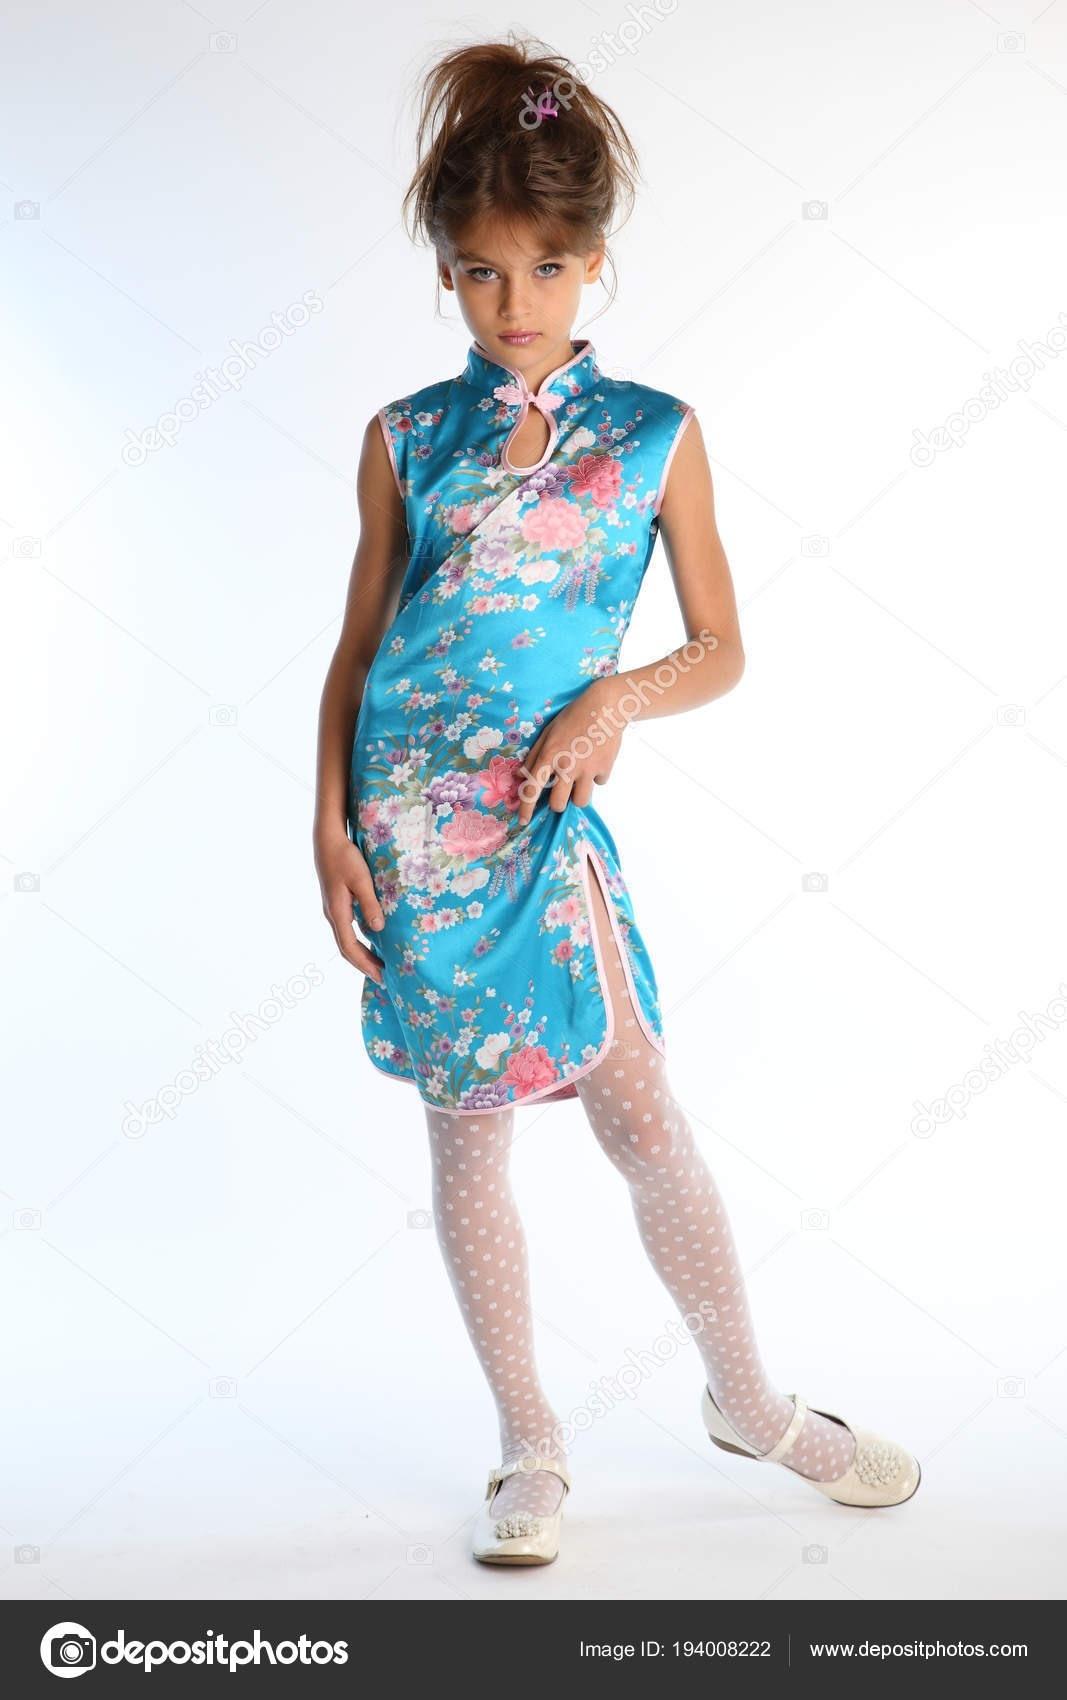 20 Elegant Schönes Blaues Kleid SpezialgebietFormal Coolste Schönes Blaues Kleid Stylish